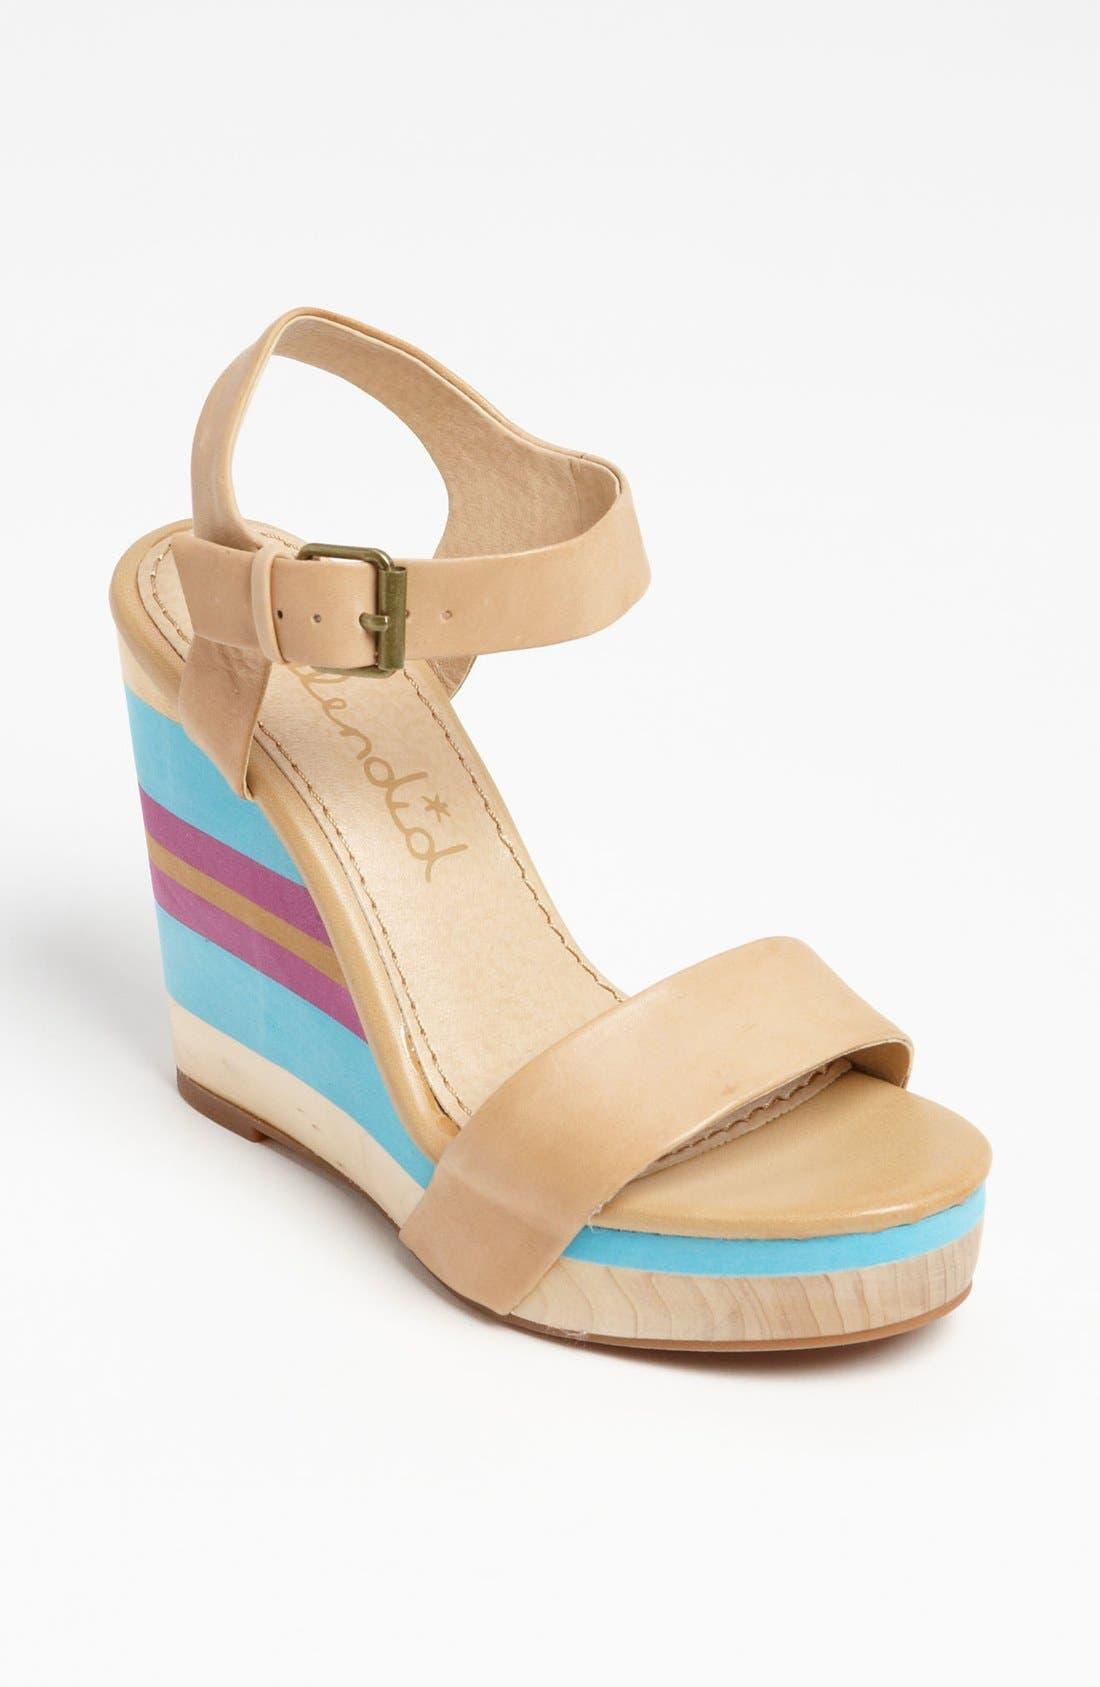 Main Image - Splendid 'Kikka' Sandal